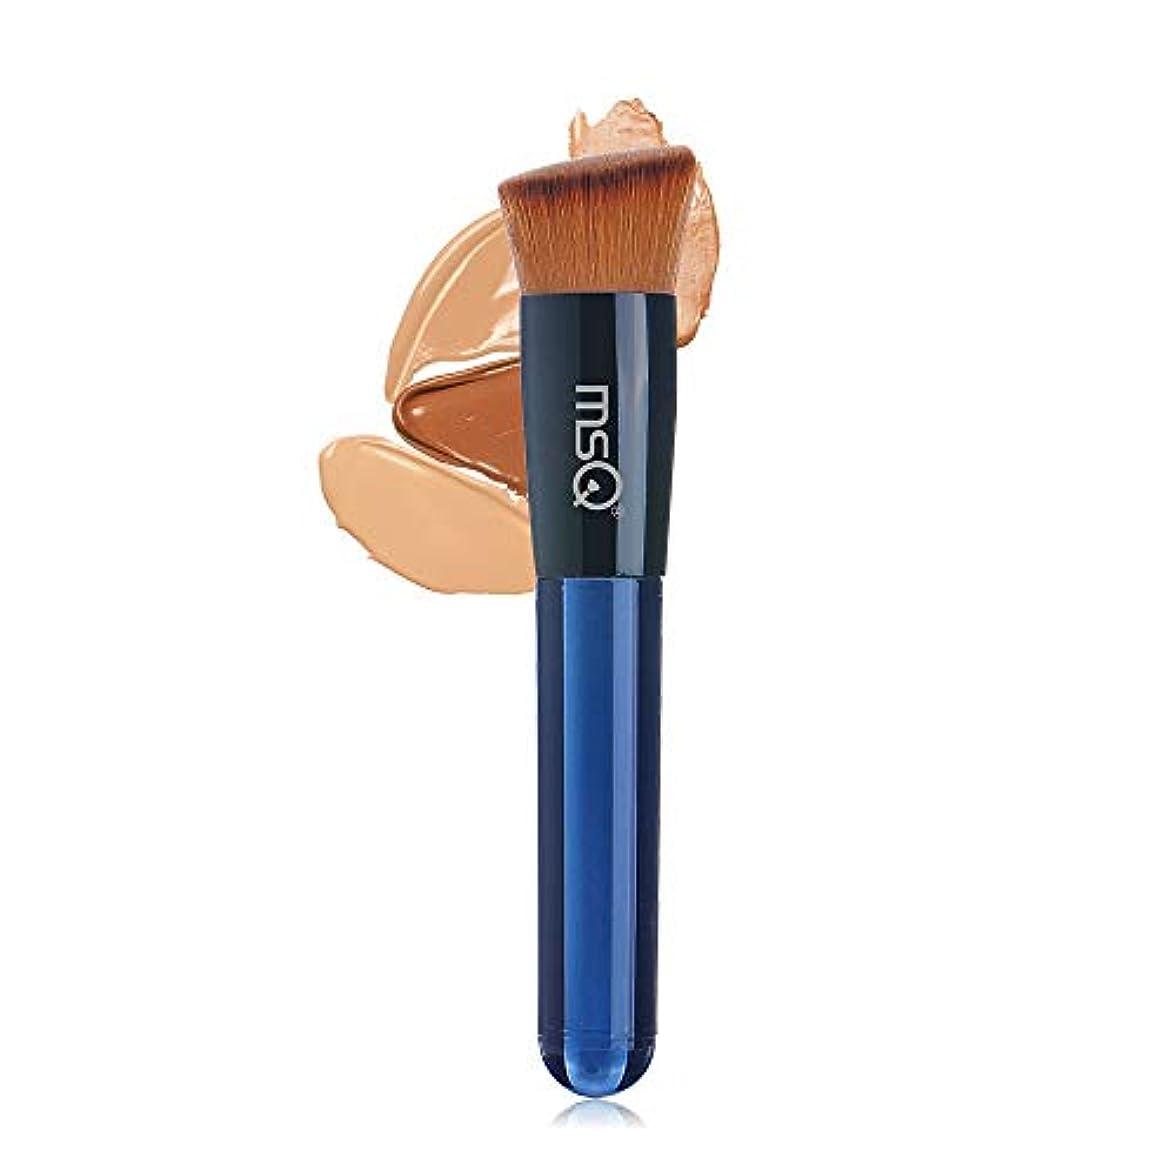 MSQ 化粧ブラシ 人気 メイクブラシ メイクアップブラシ 粧ブラシ 可愛い 化粧筆 肌に優しい ファンデーシ (ファンデーションブラシ)